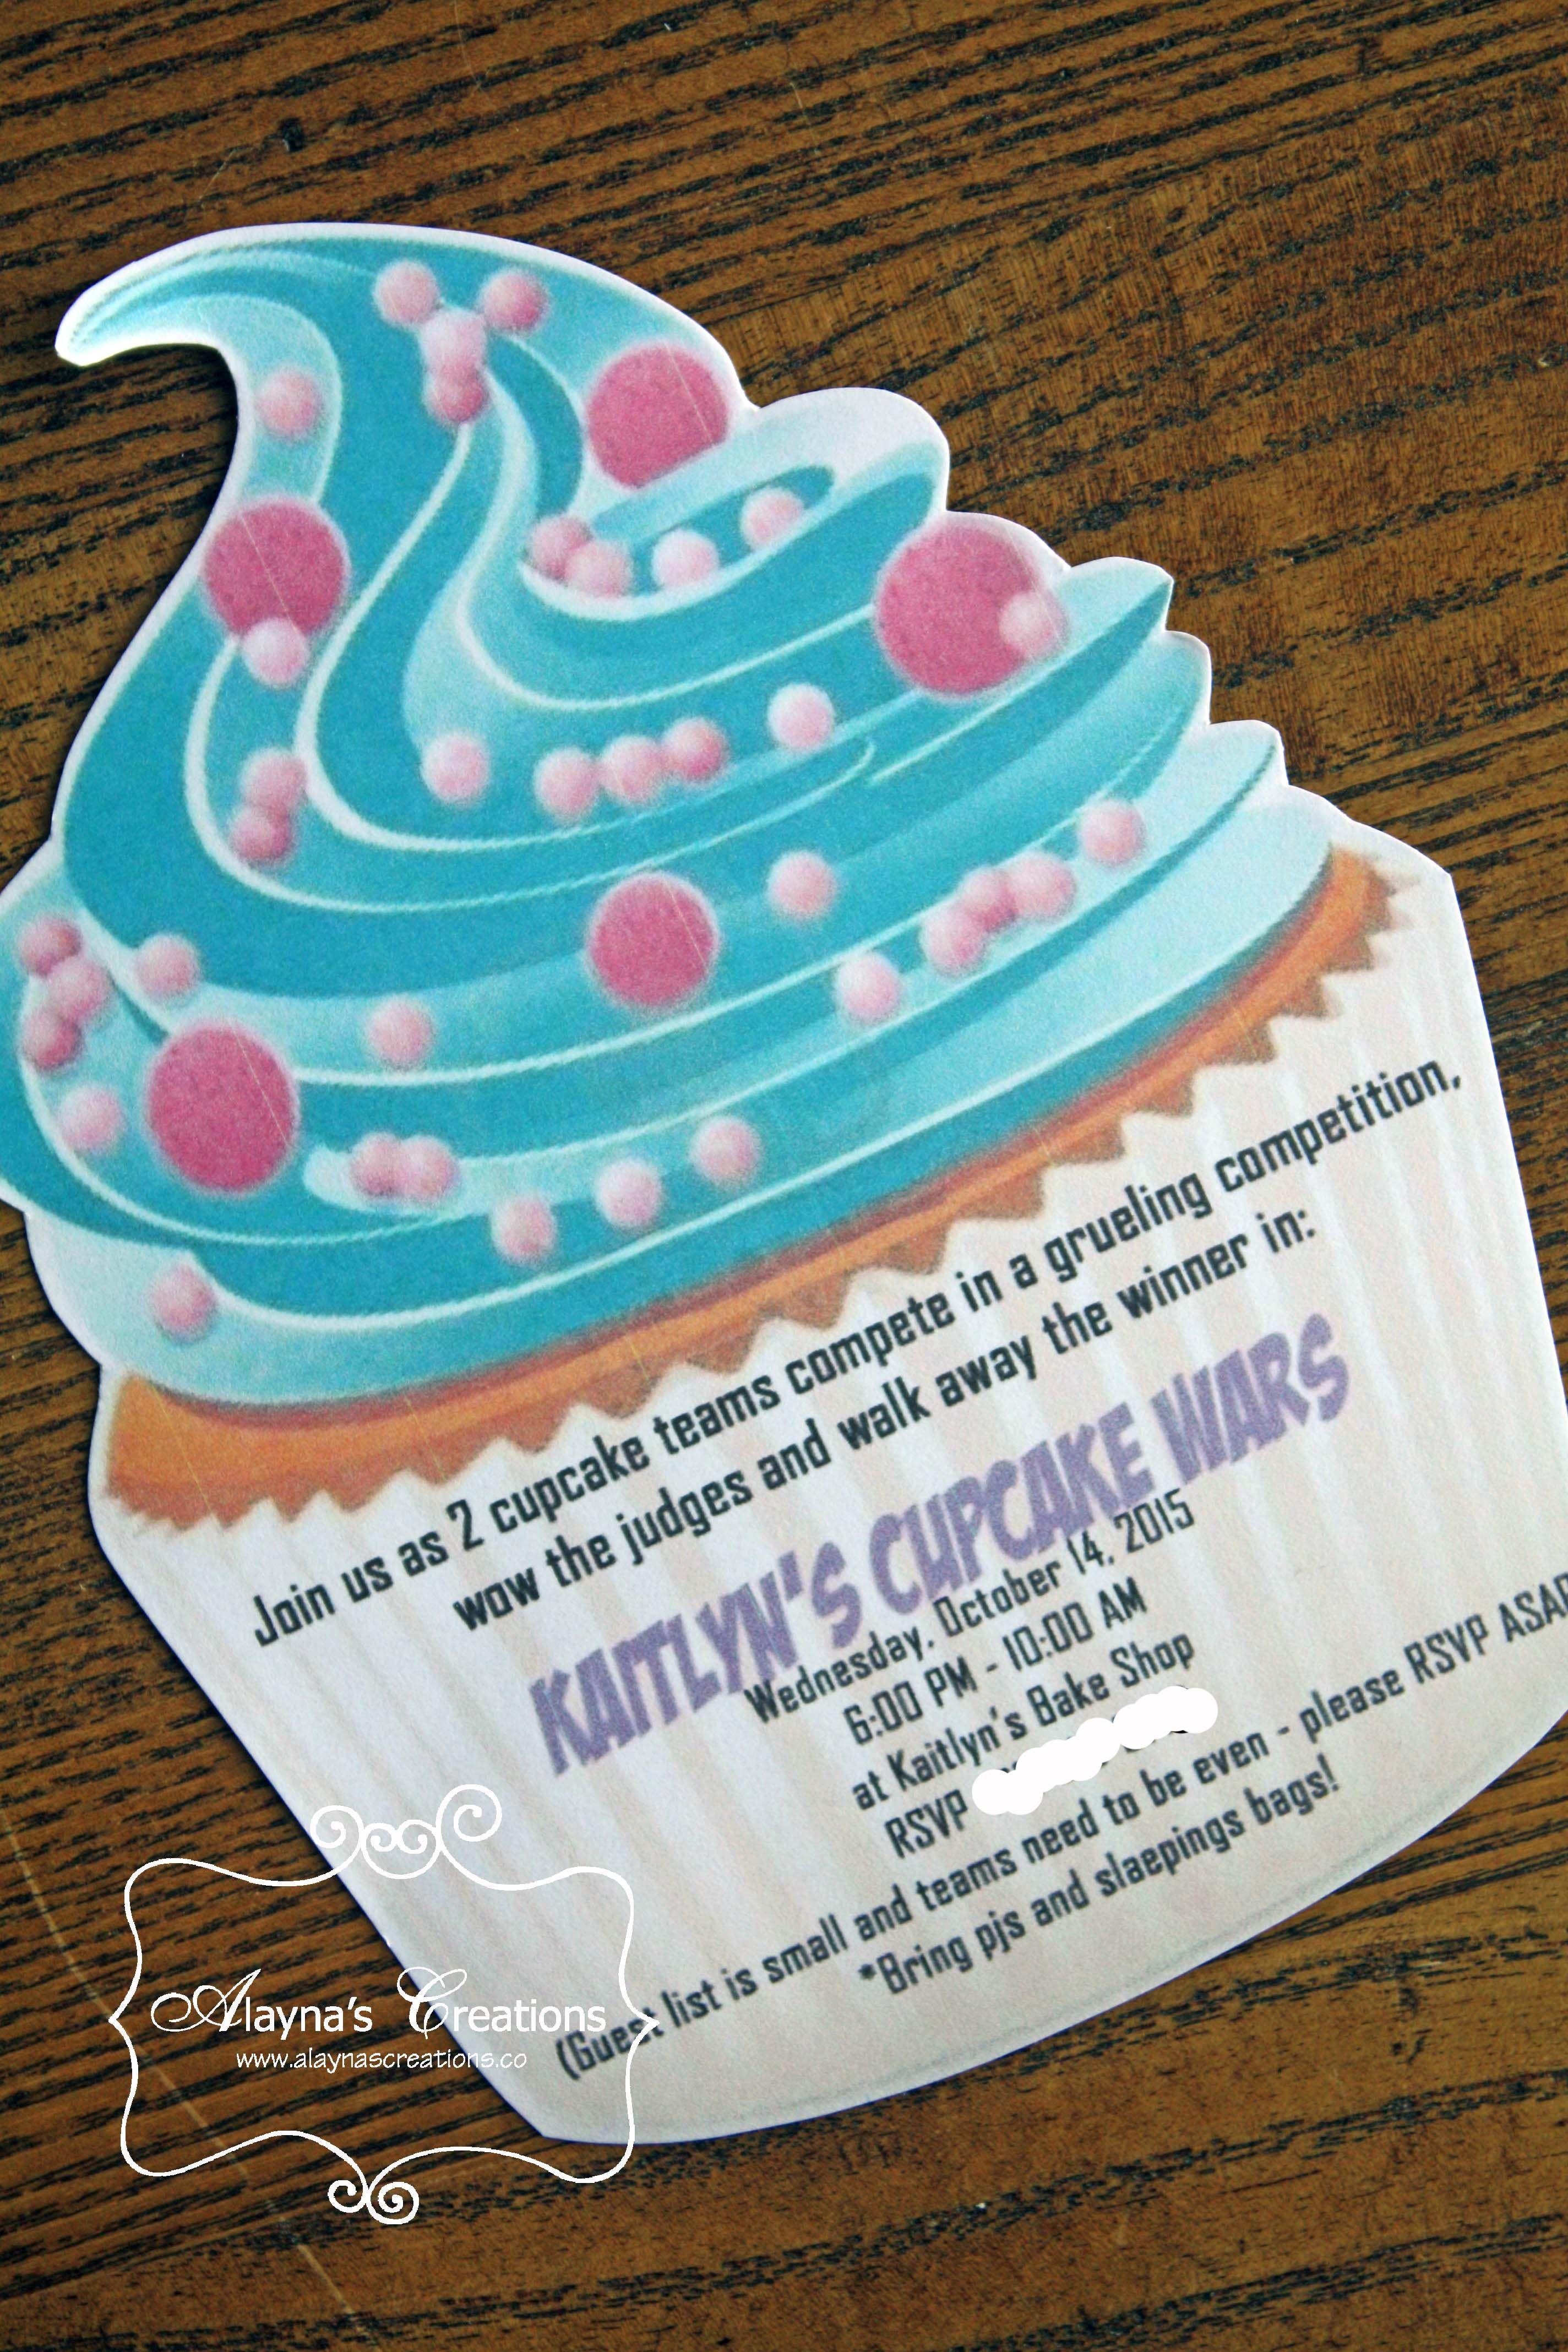 Cupcake Wars Birthday Party - Invitation | Party invitations ...